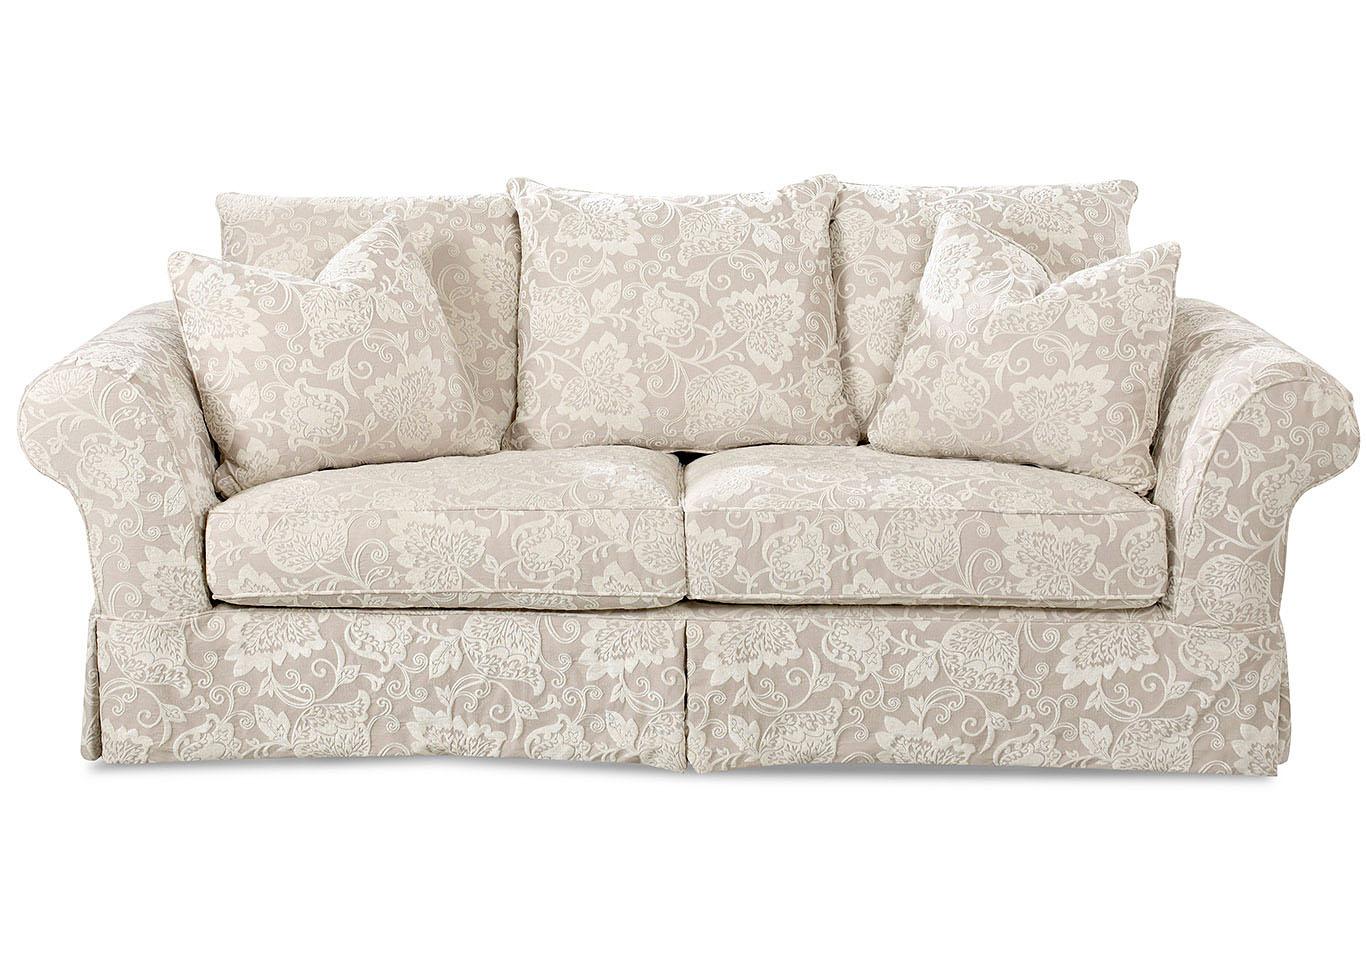 Write A Review - Charleston Renaissance Putty Pattern Fabric Sofa - Best Buy Furniture And Mattress